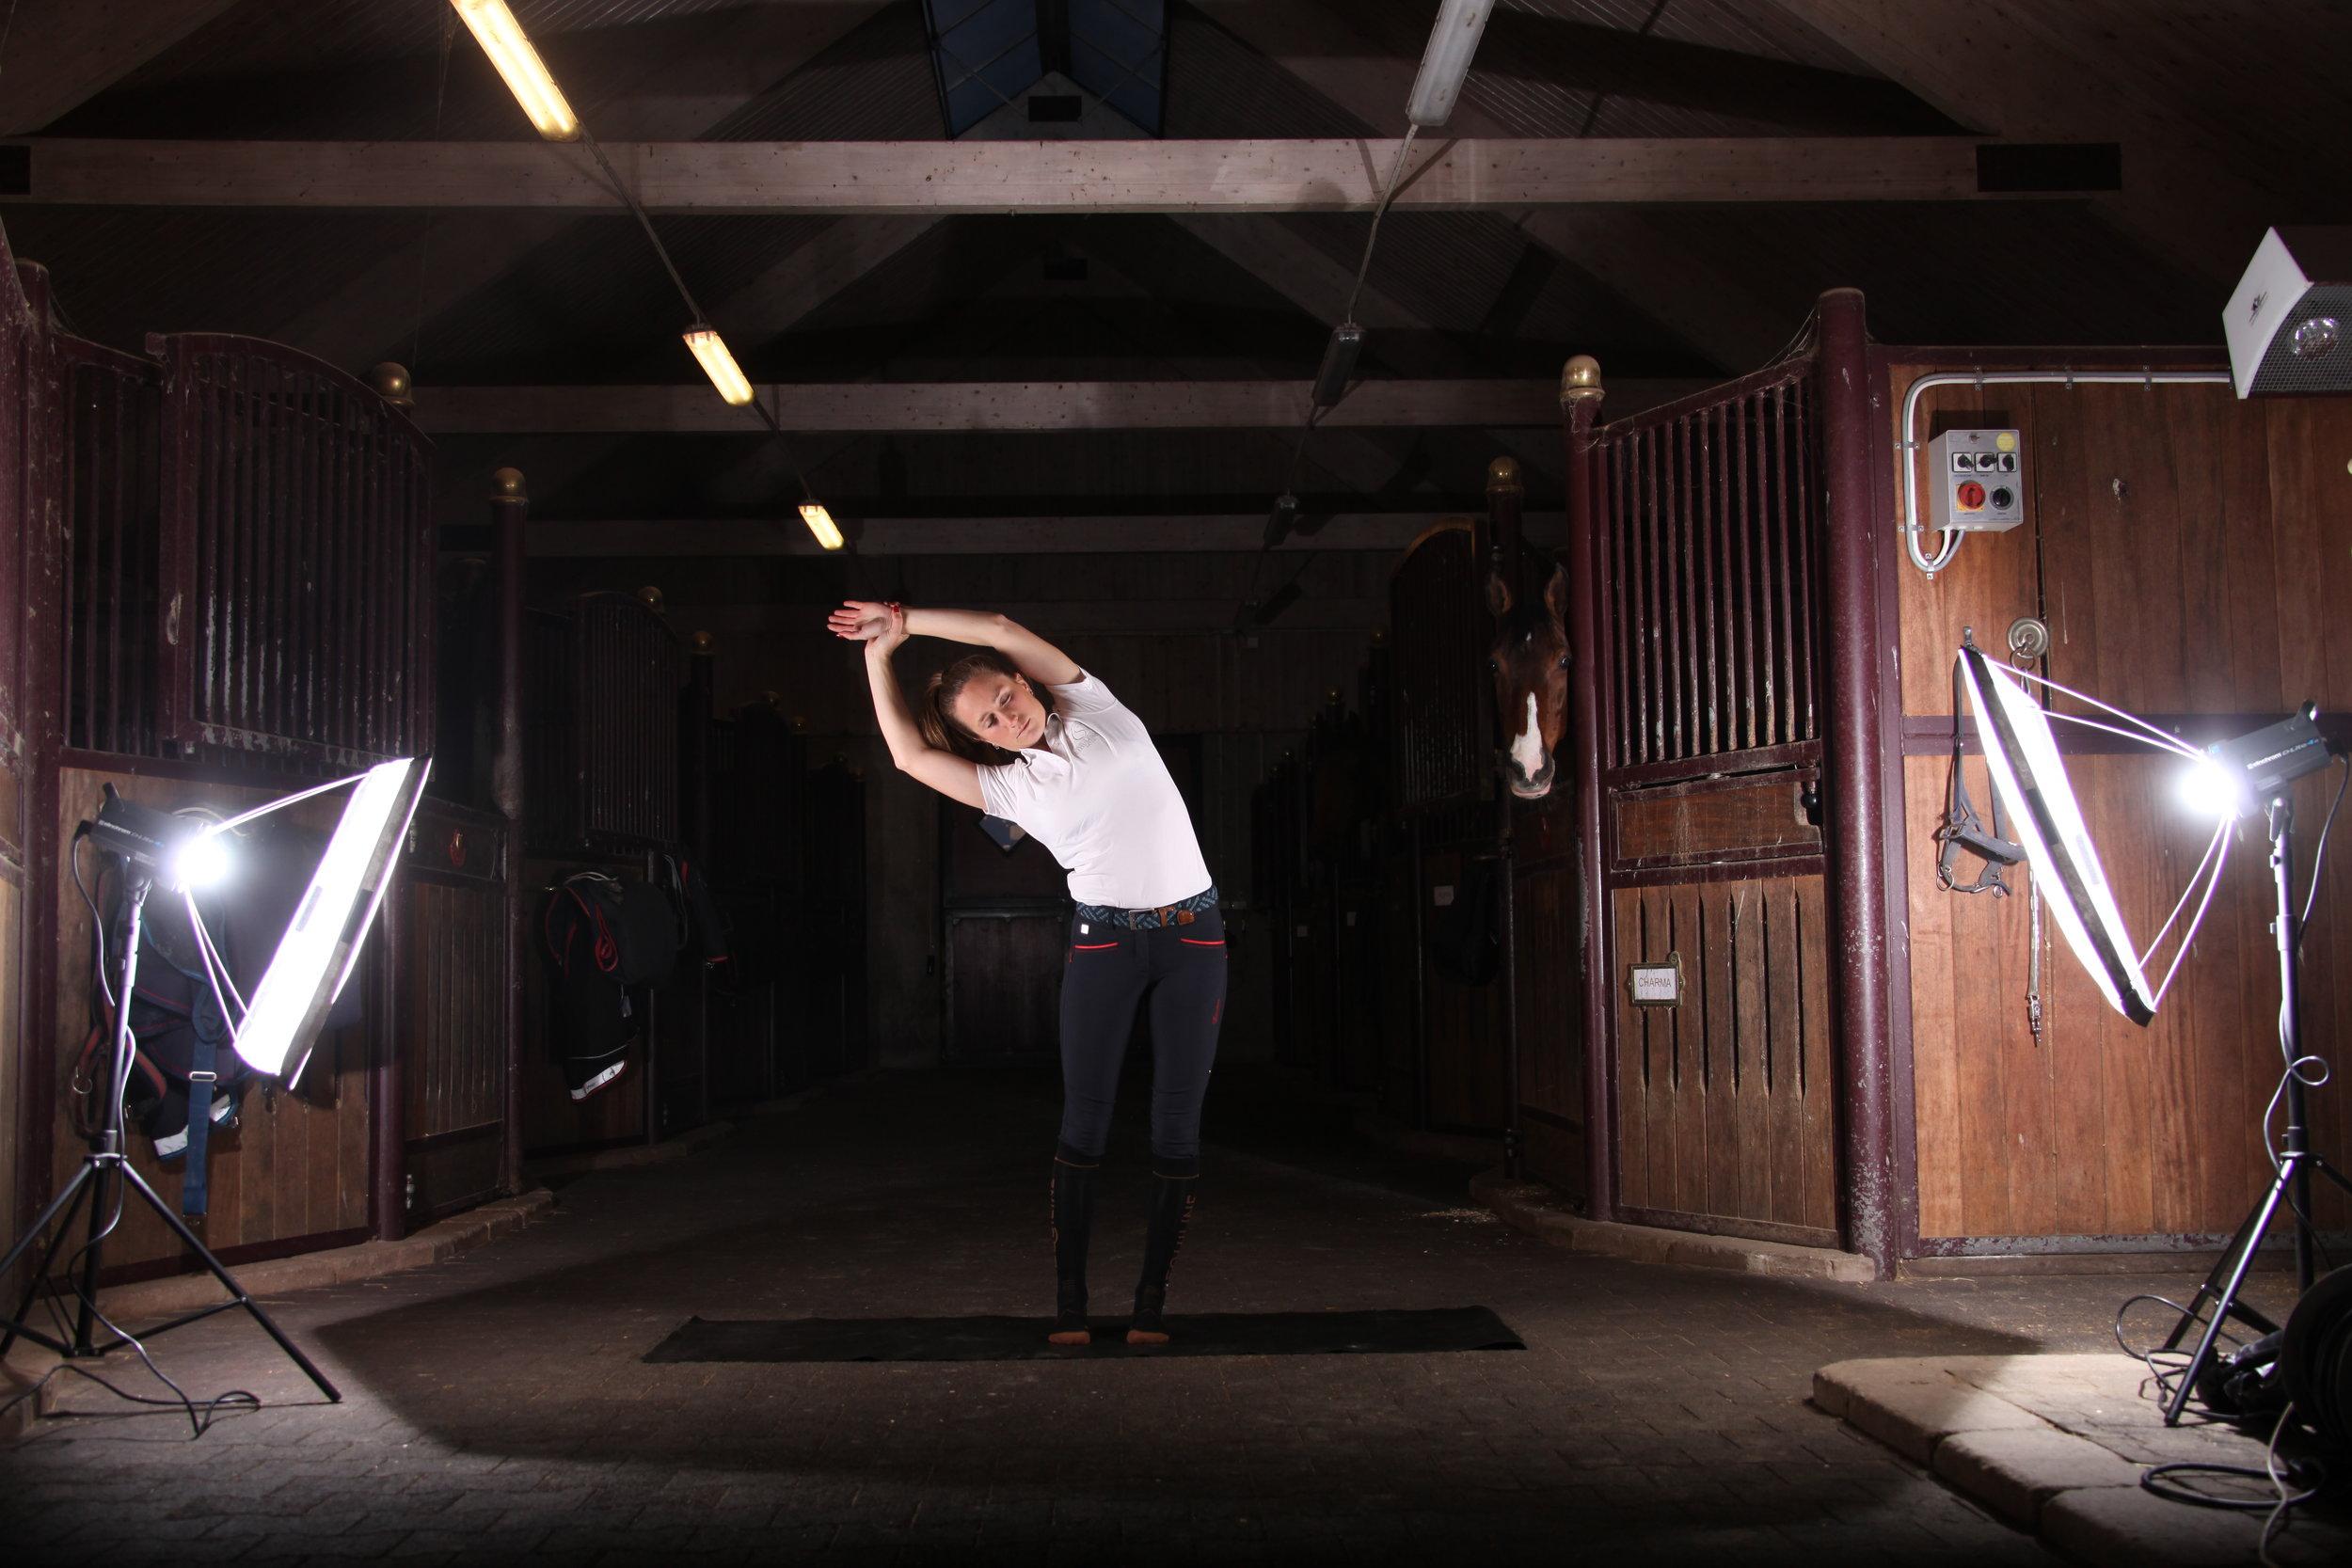 Irma Karlsson - Show Jumping